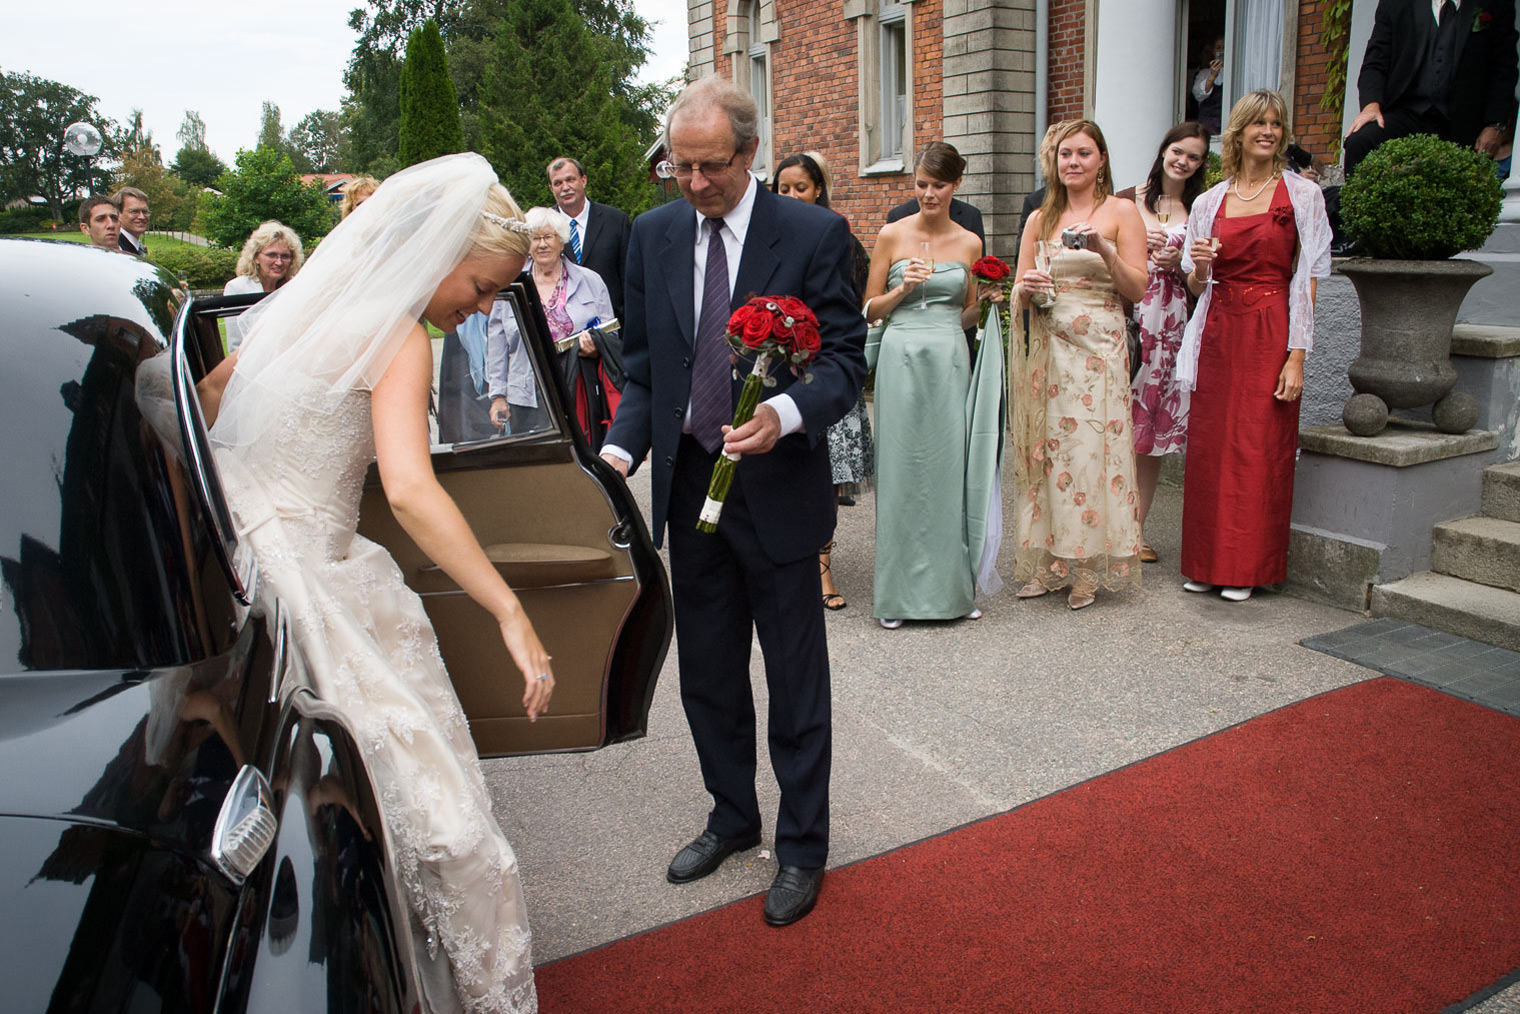 Wedding Photos at Thorskogs slott